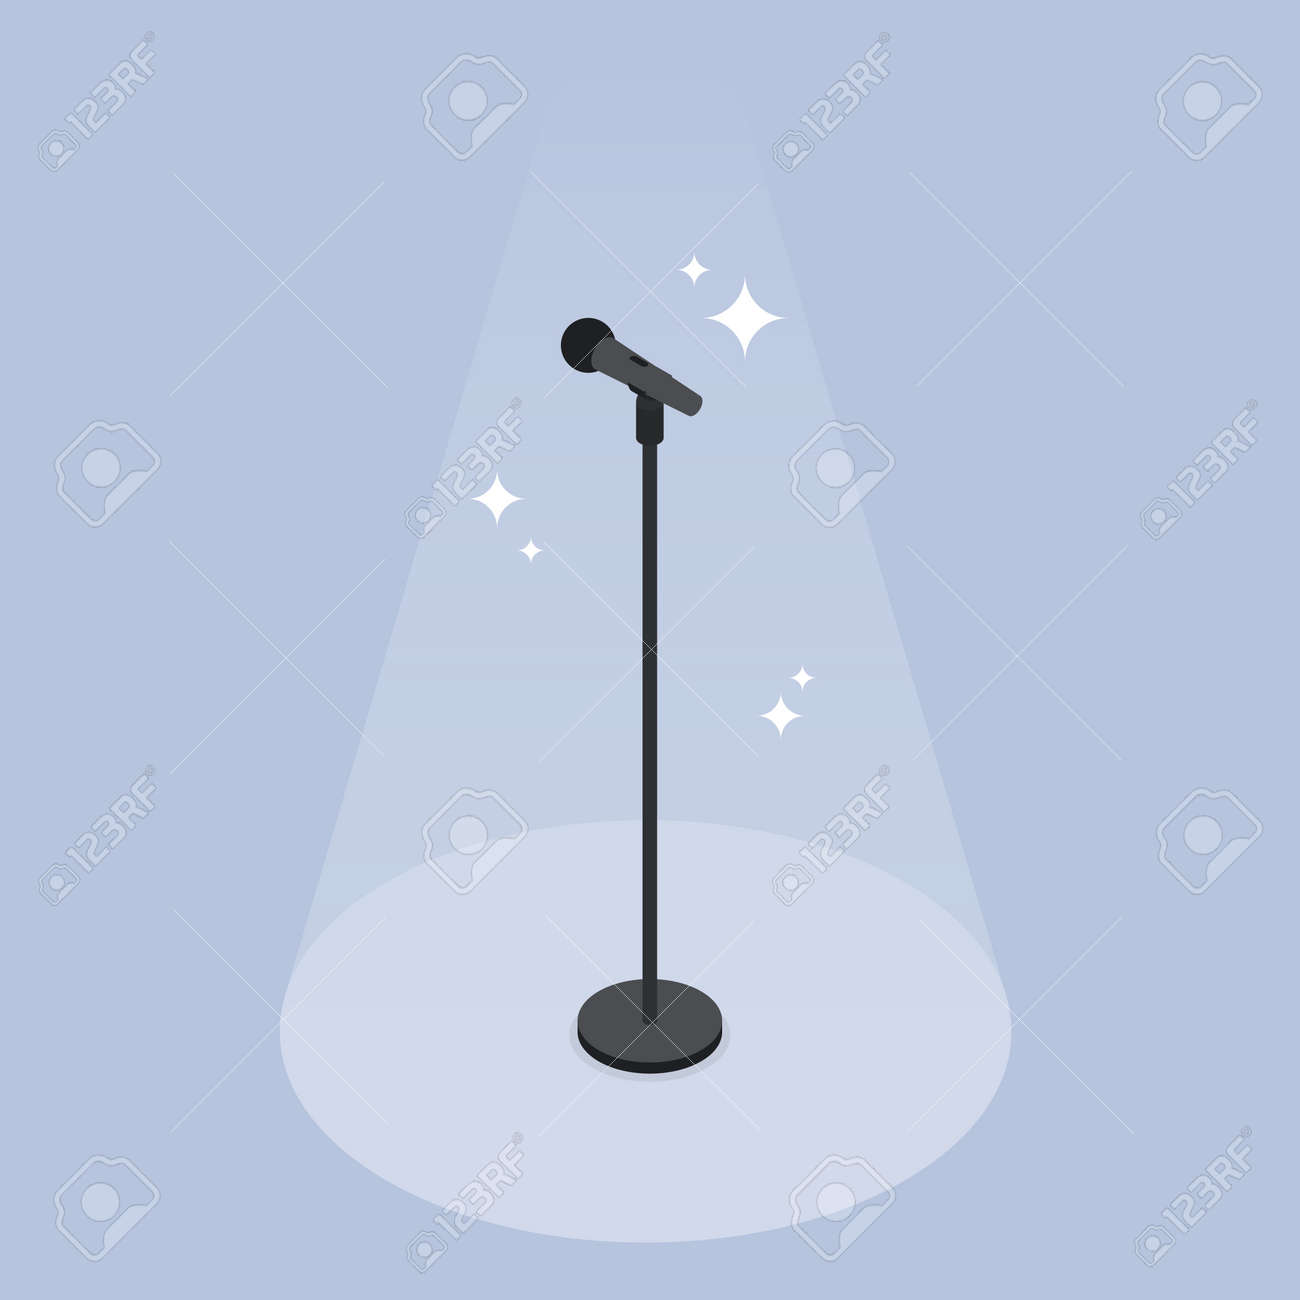 Performance Microphone Isometric Illustration - 173223702